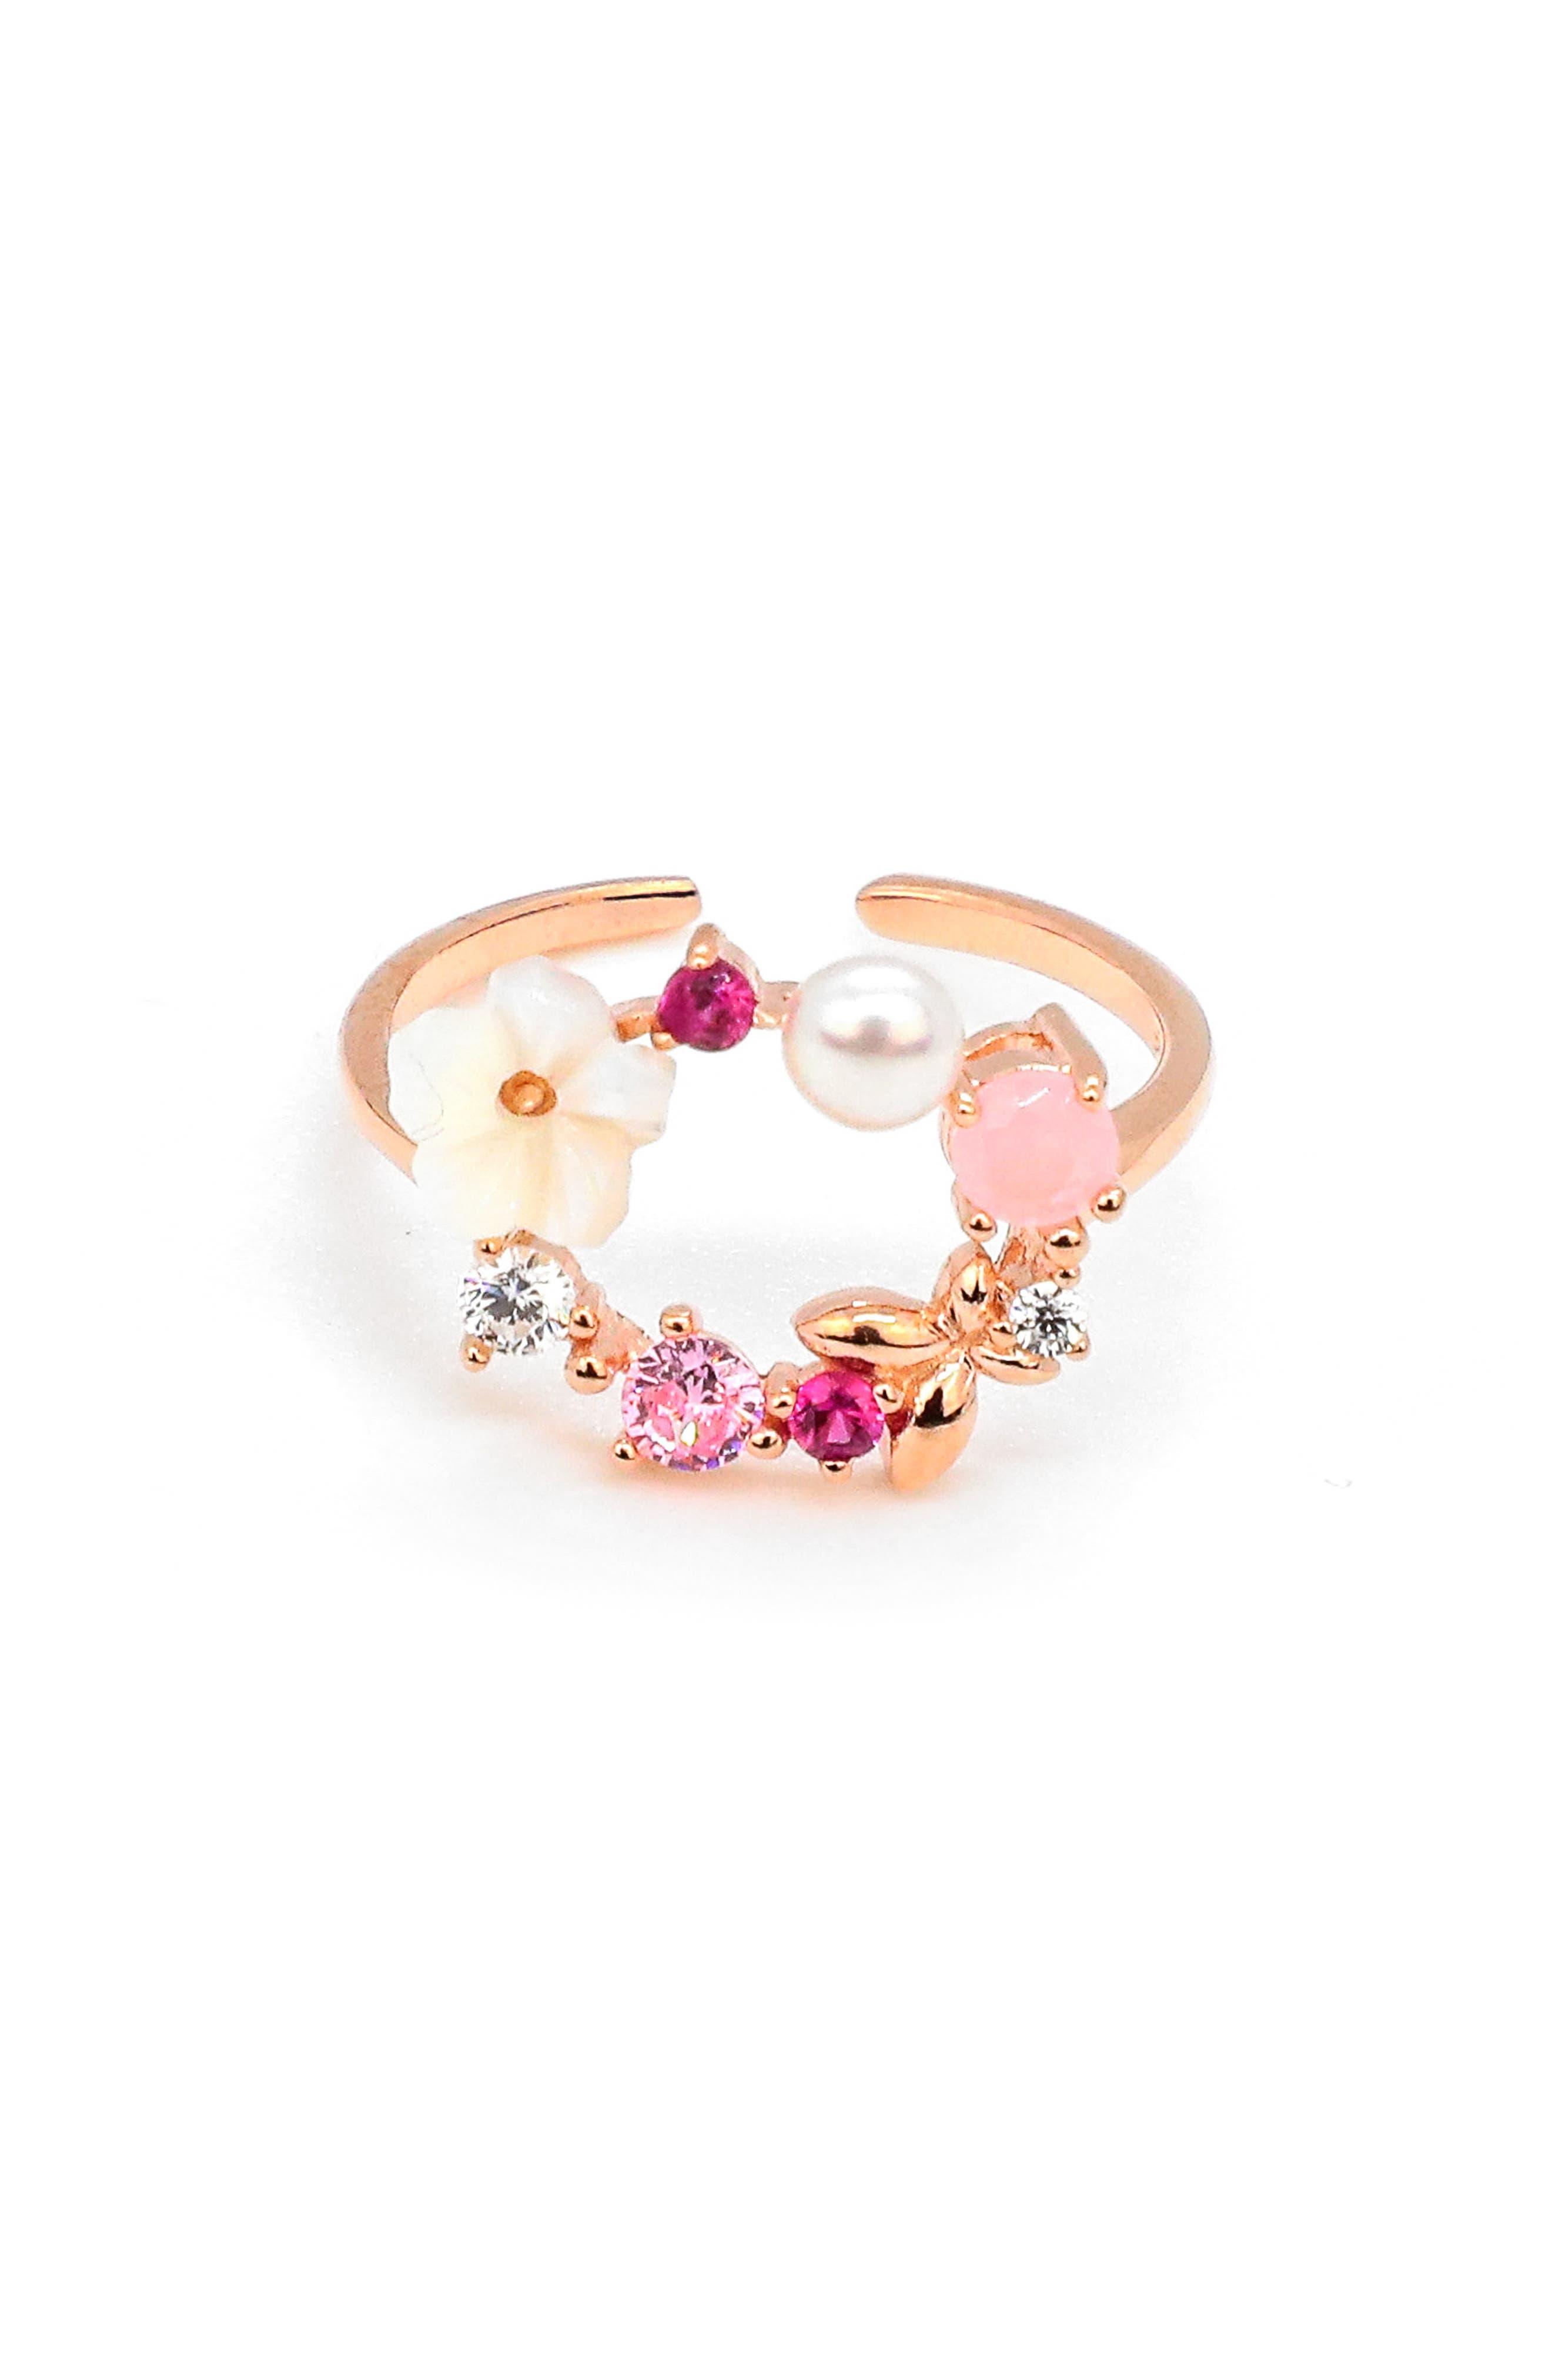 Dazzling Sloane Summer Is Mine Ring